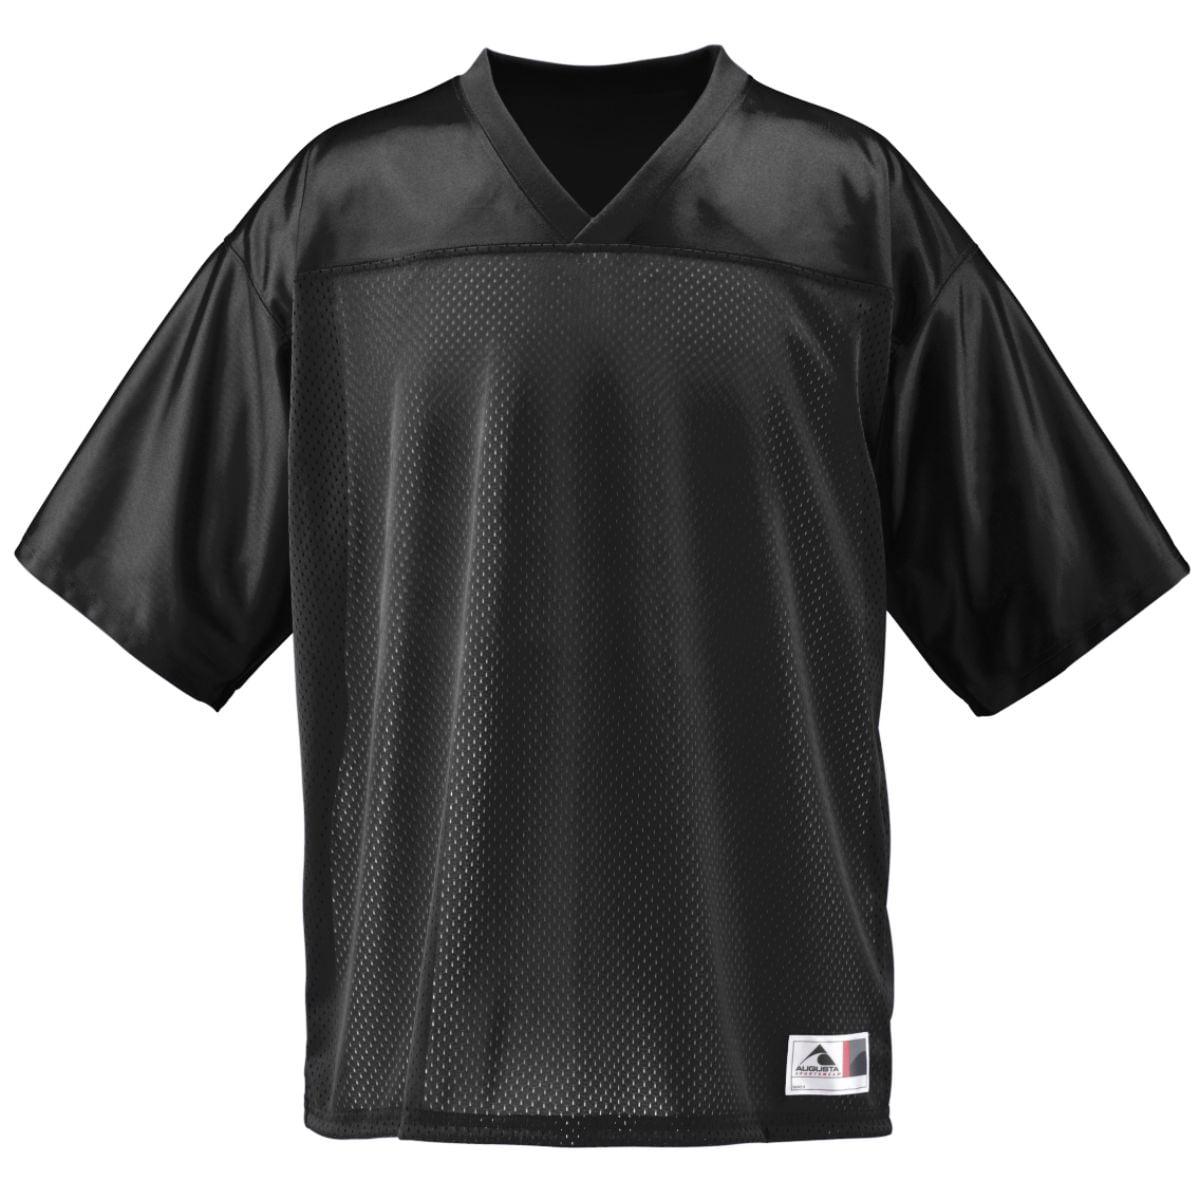 Augusta Youth Stadium Replica Jersey Black S - image 1 of 1